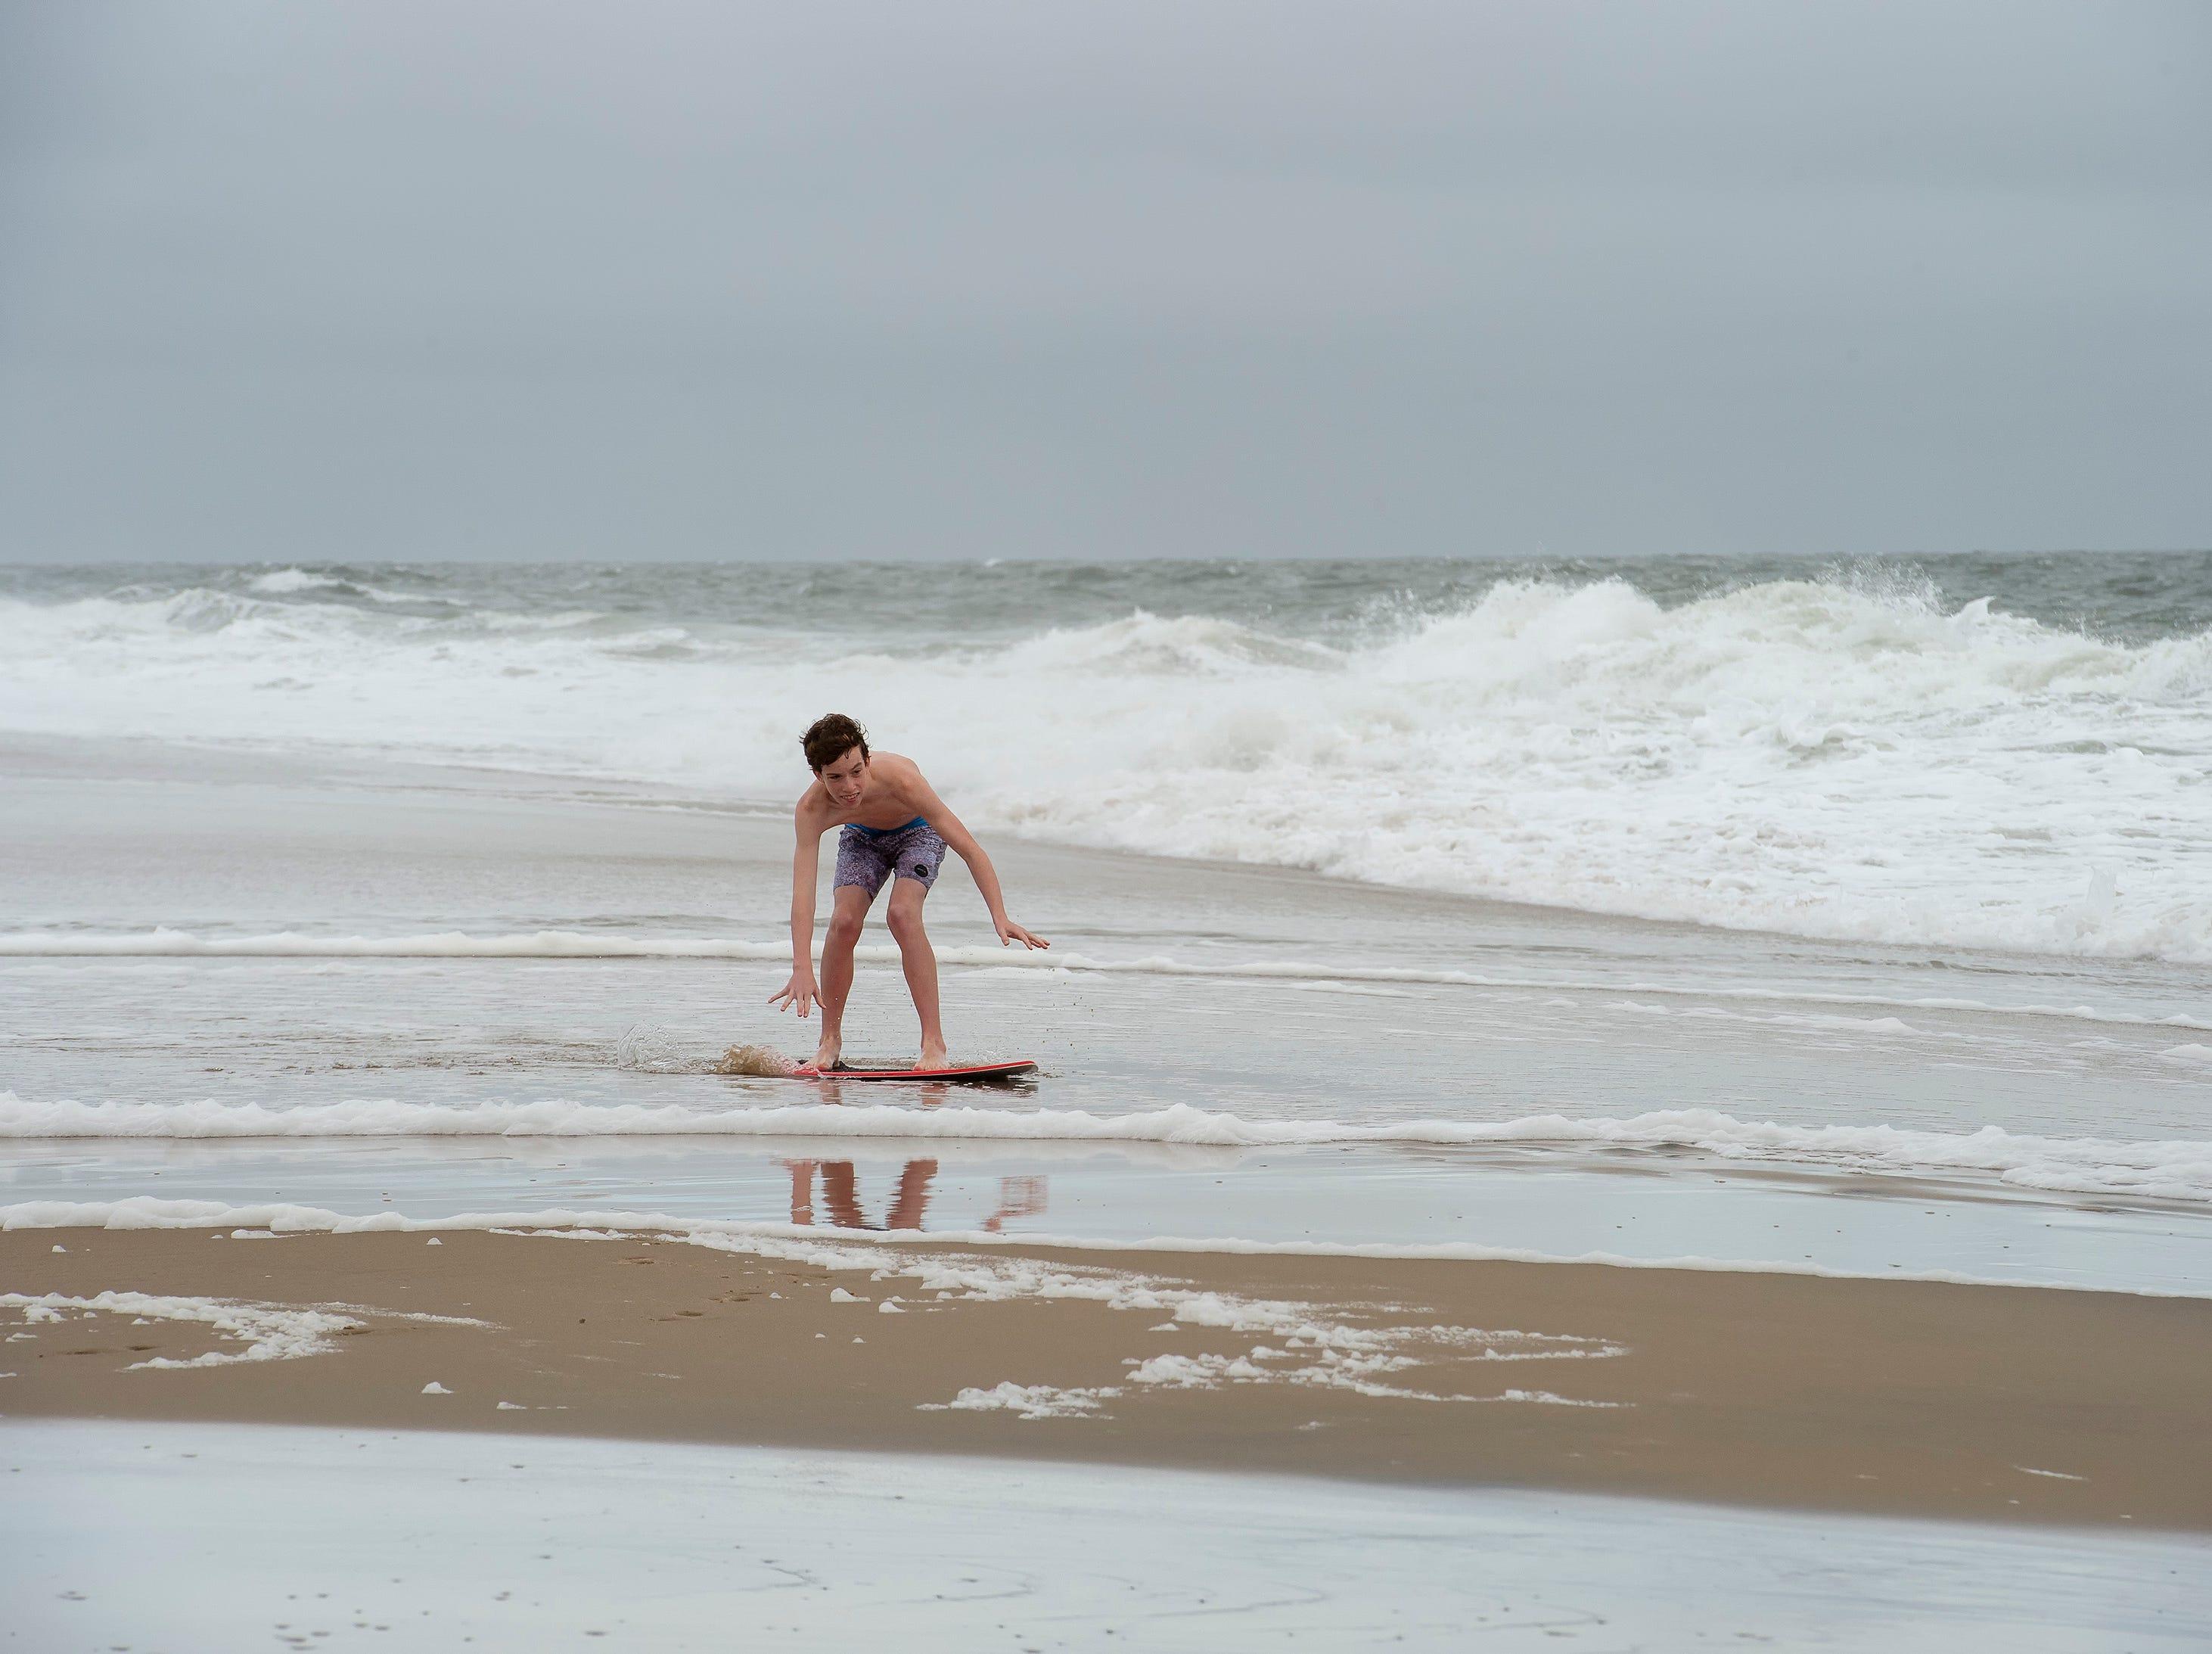 Ben Hess (13) of Leesburg, Va., rides his skim board at Bethany Beach after Hurricane Florence made landfall in North Carolina.